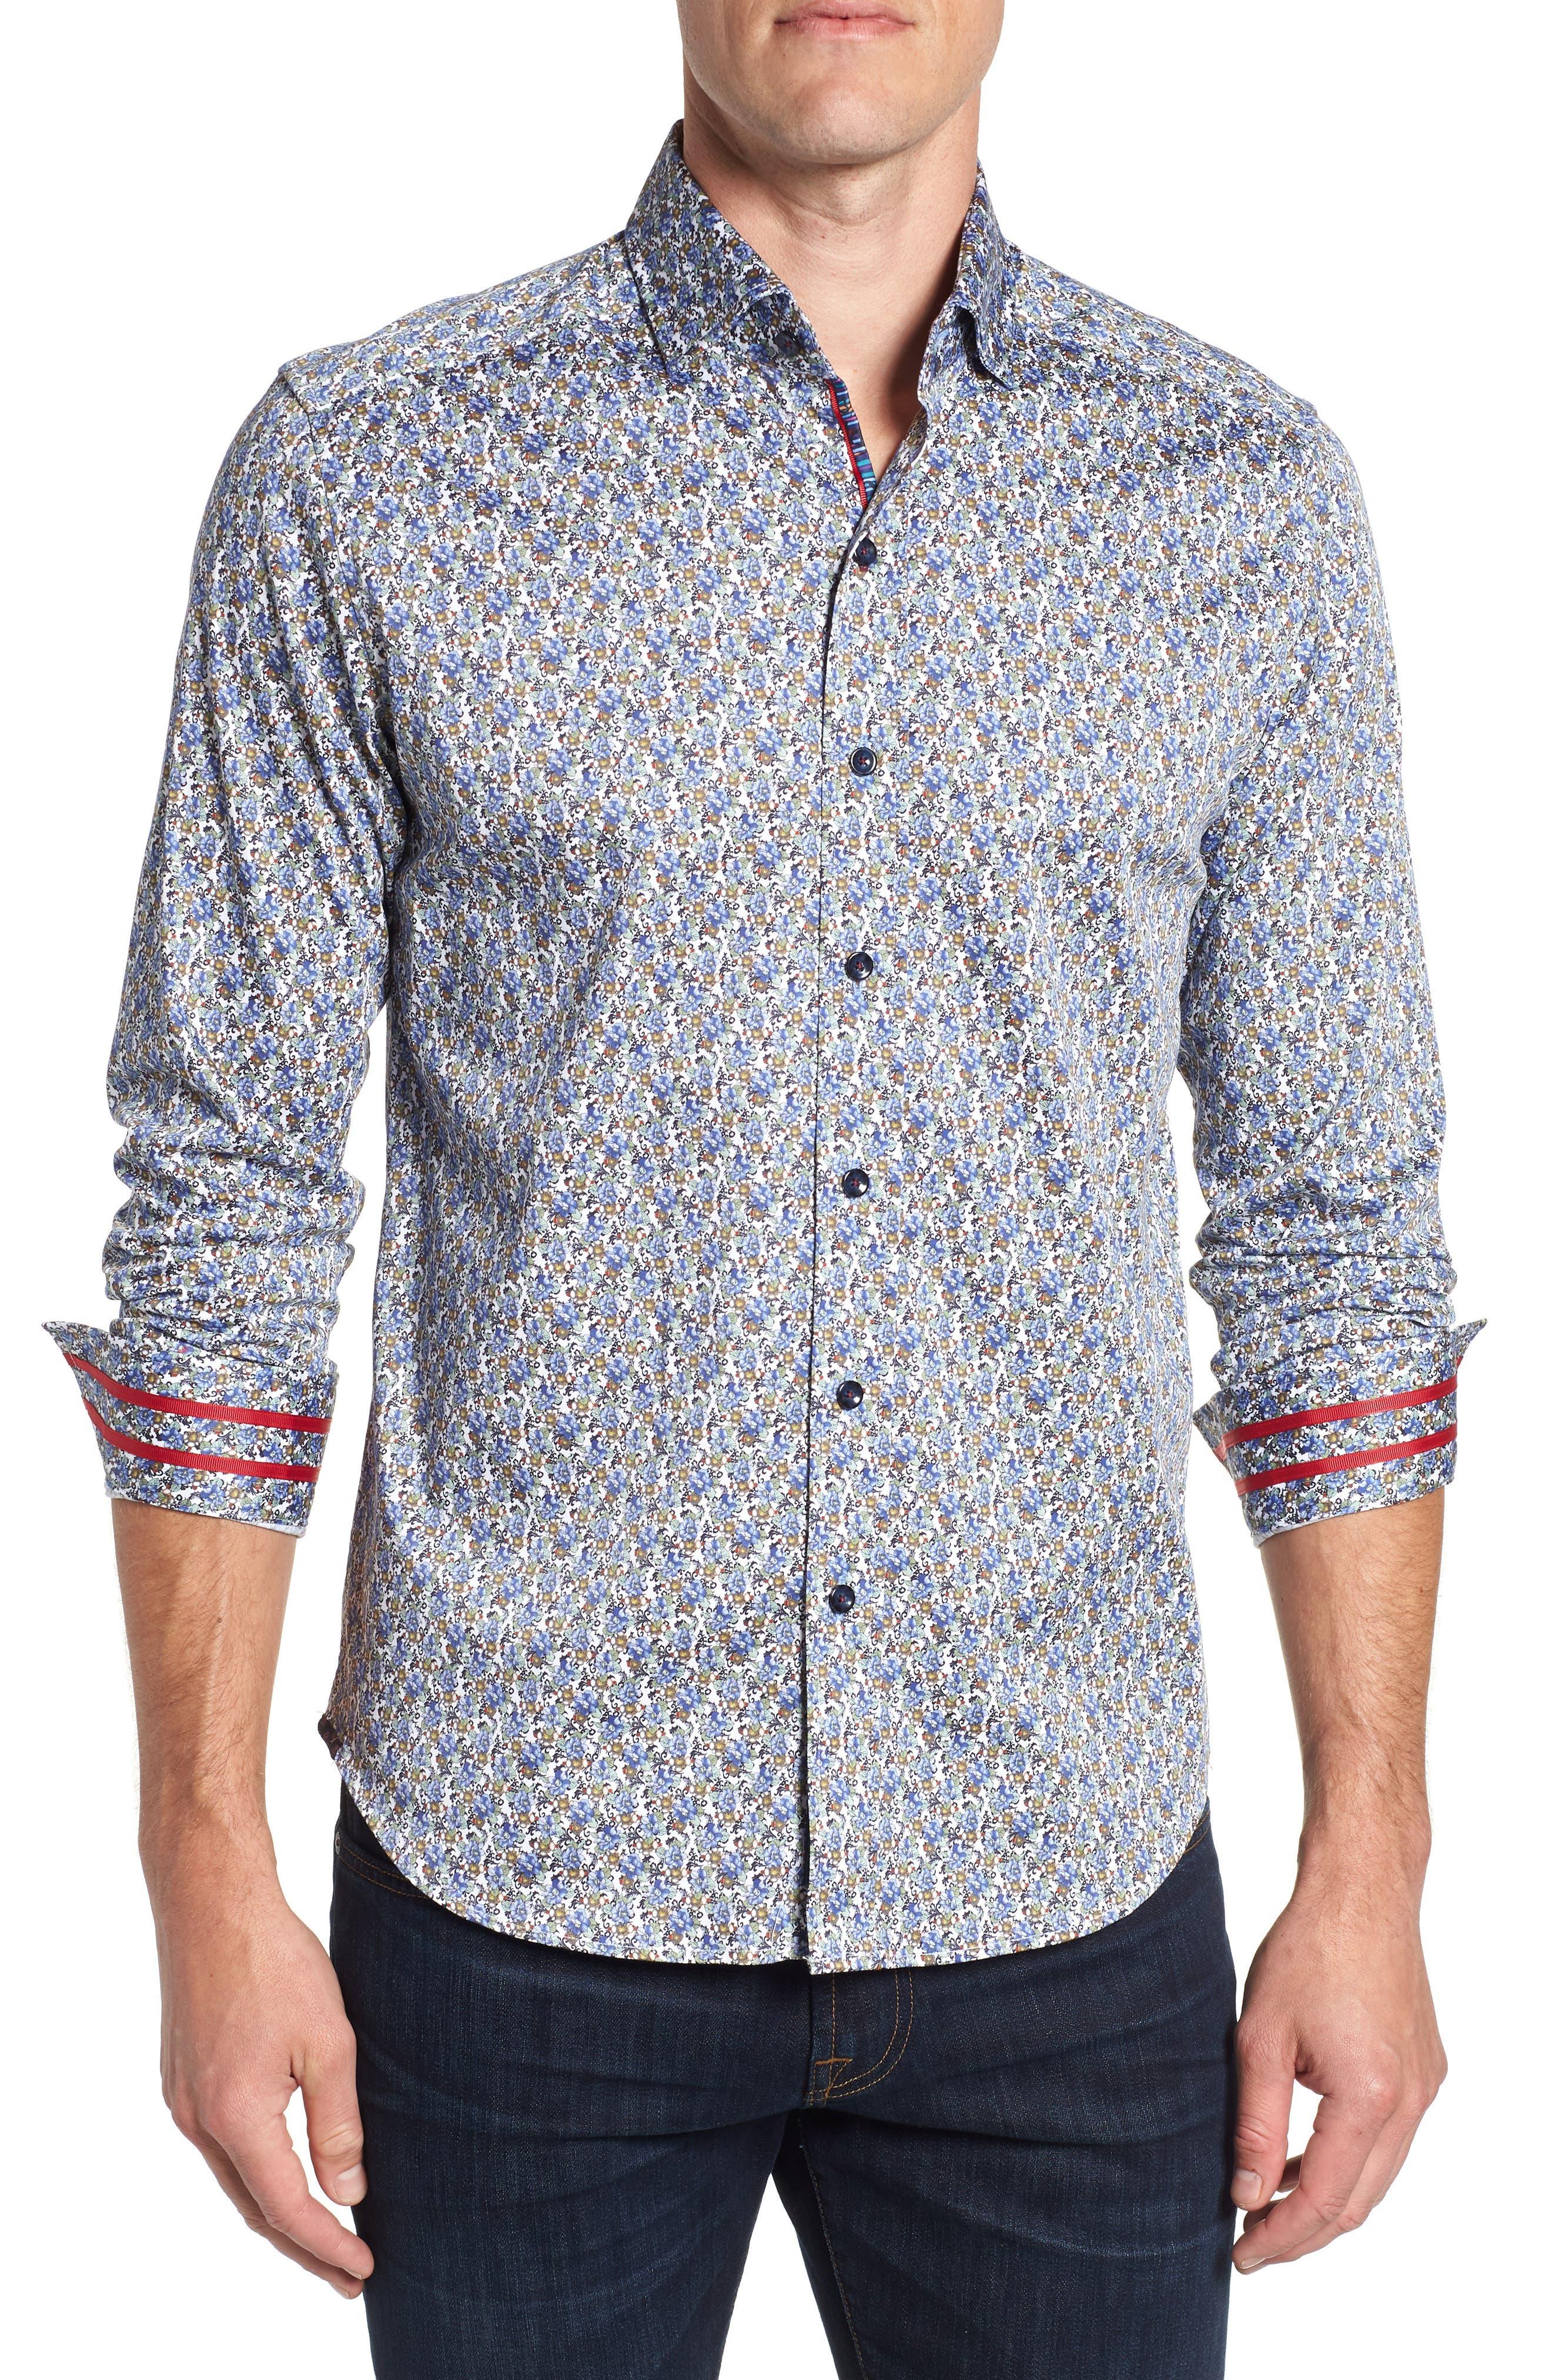 Richardson Tailored Fit Print Sport Shirt,                             Main thumbnail 1, color,                             400